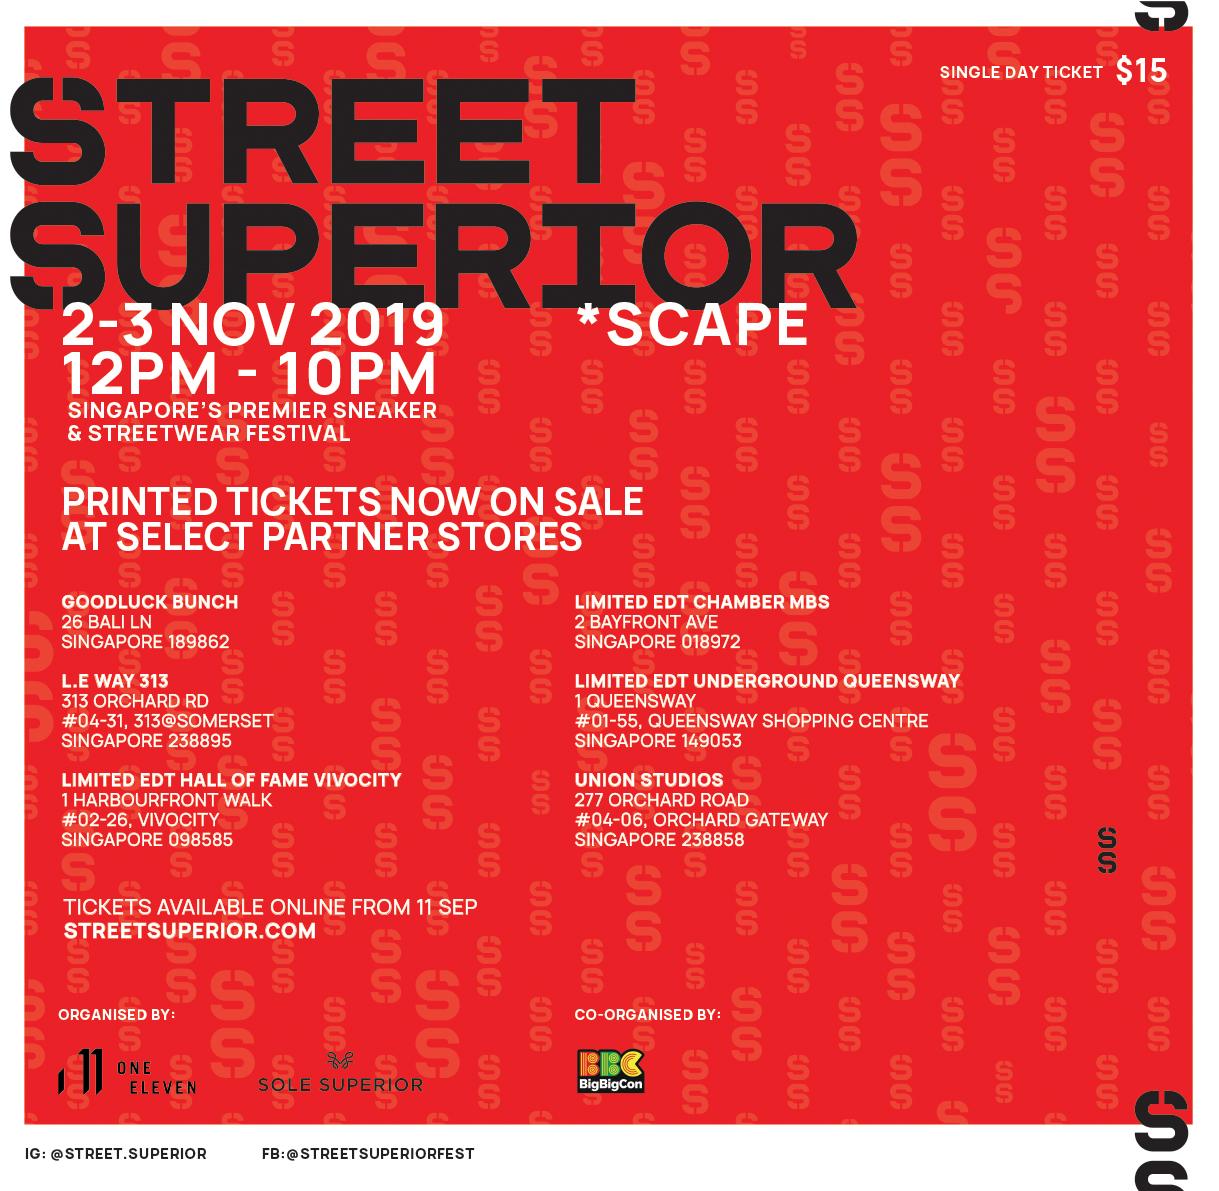 street superior 2019 singapore ticket stockists